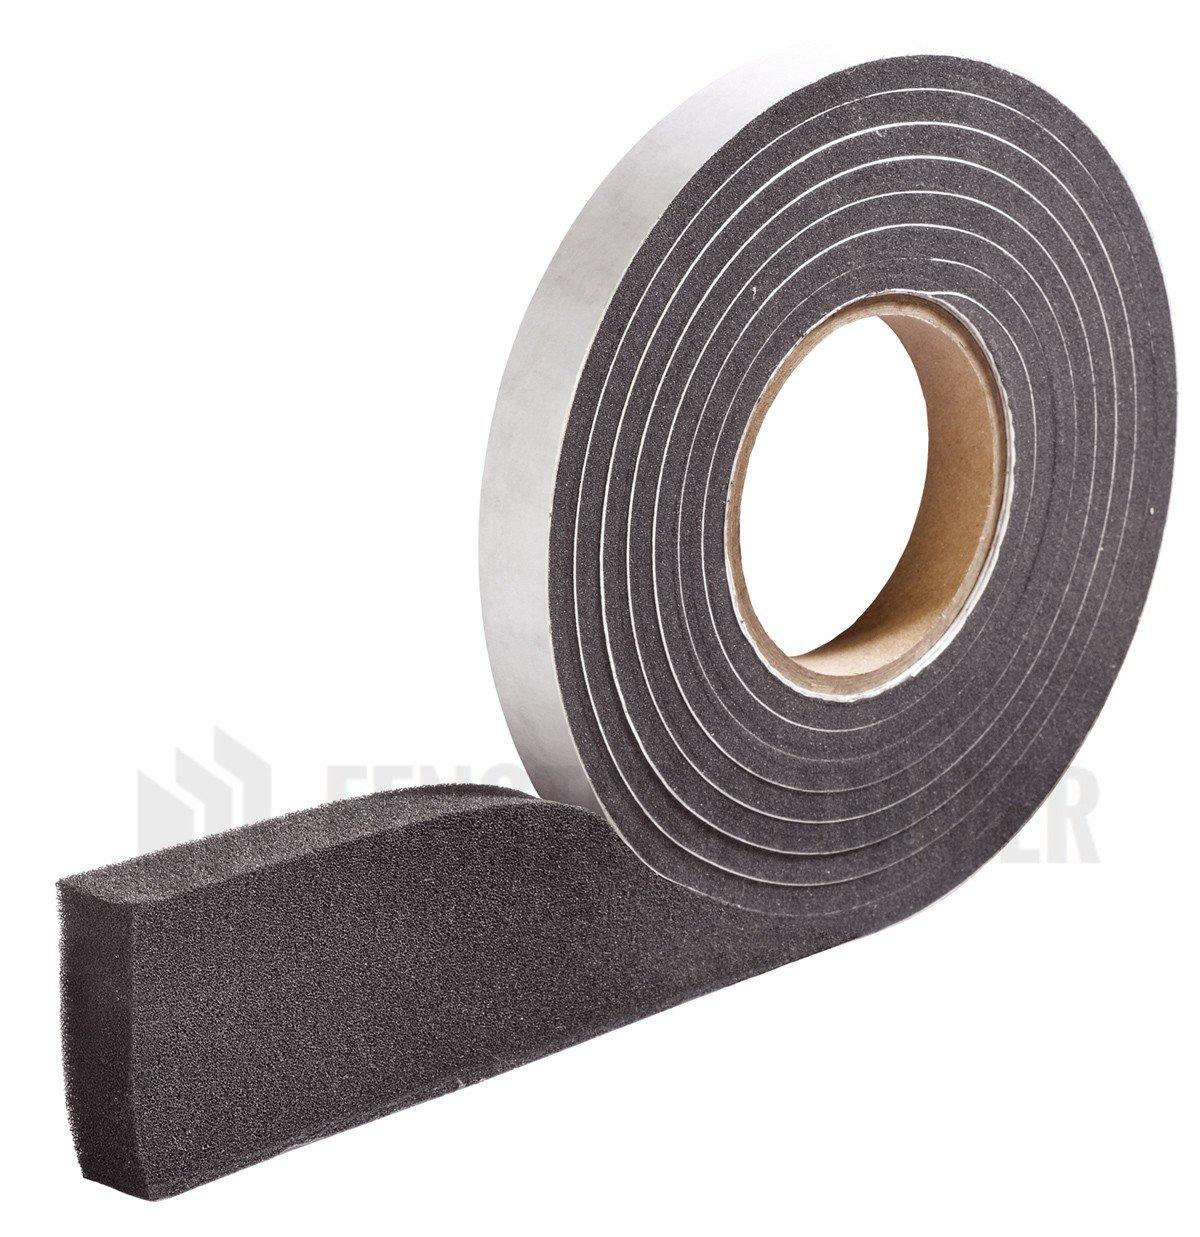 HANNOBAND BG1 Kompriband 20/1,5-2,5 Fugendichtband 600 Pa Quellband Fensterband Fugenband - 12m Rolle, grau